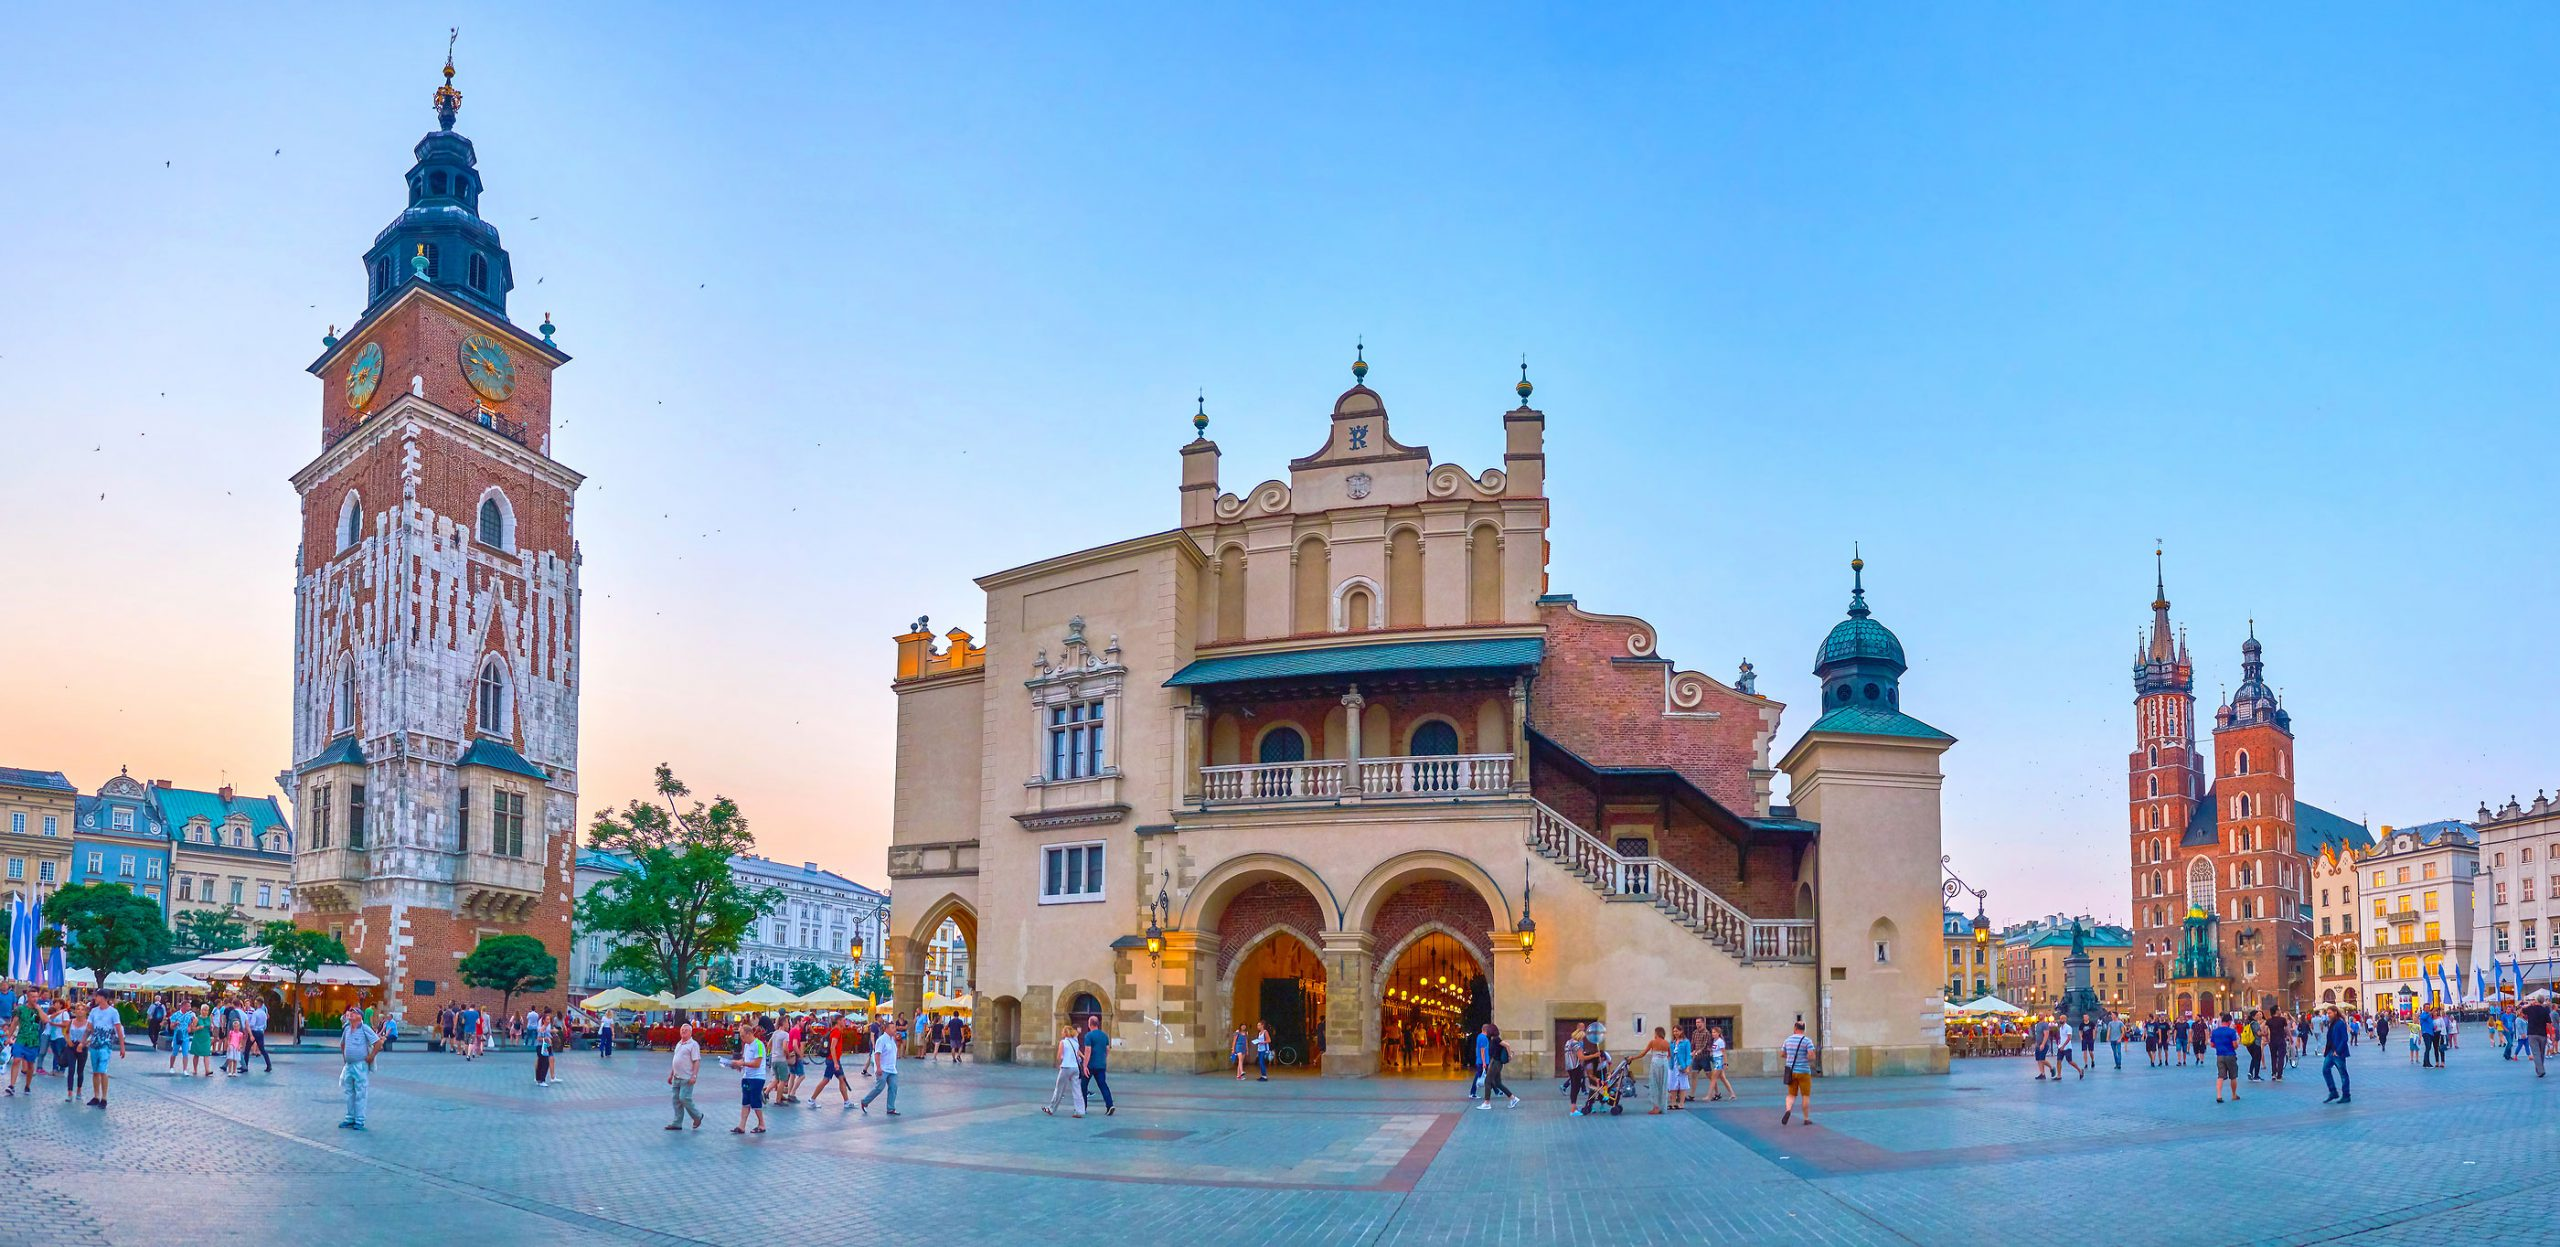 Krakow bysentrum markedsplassen